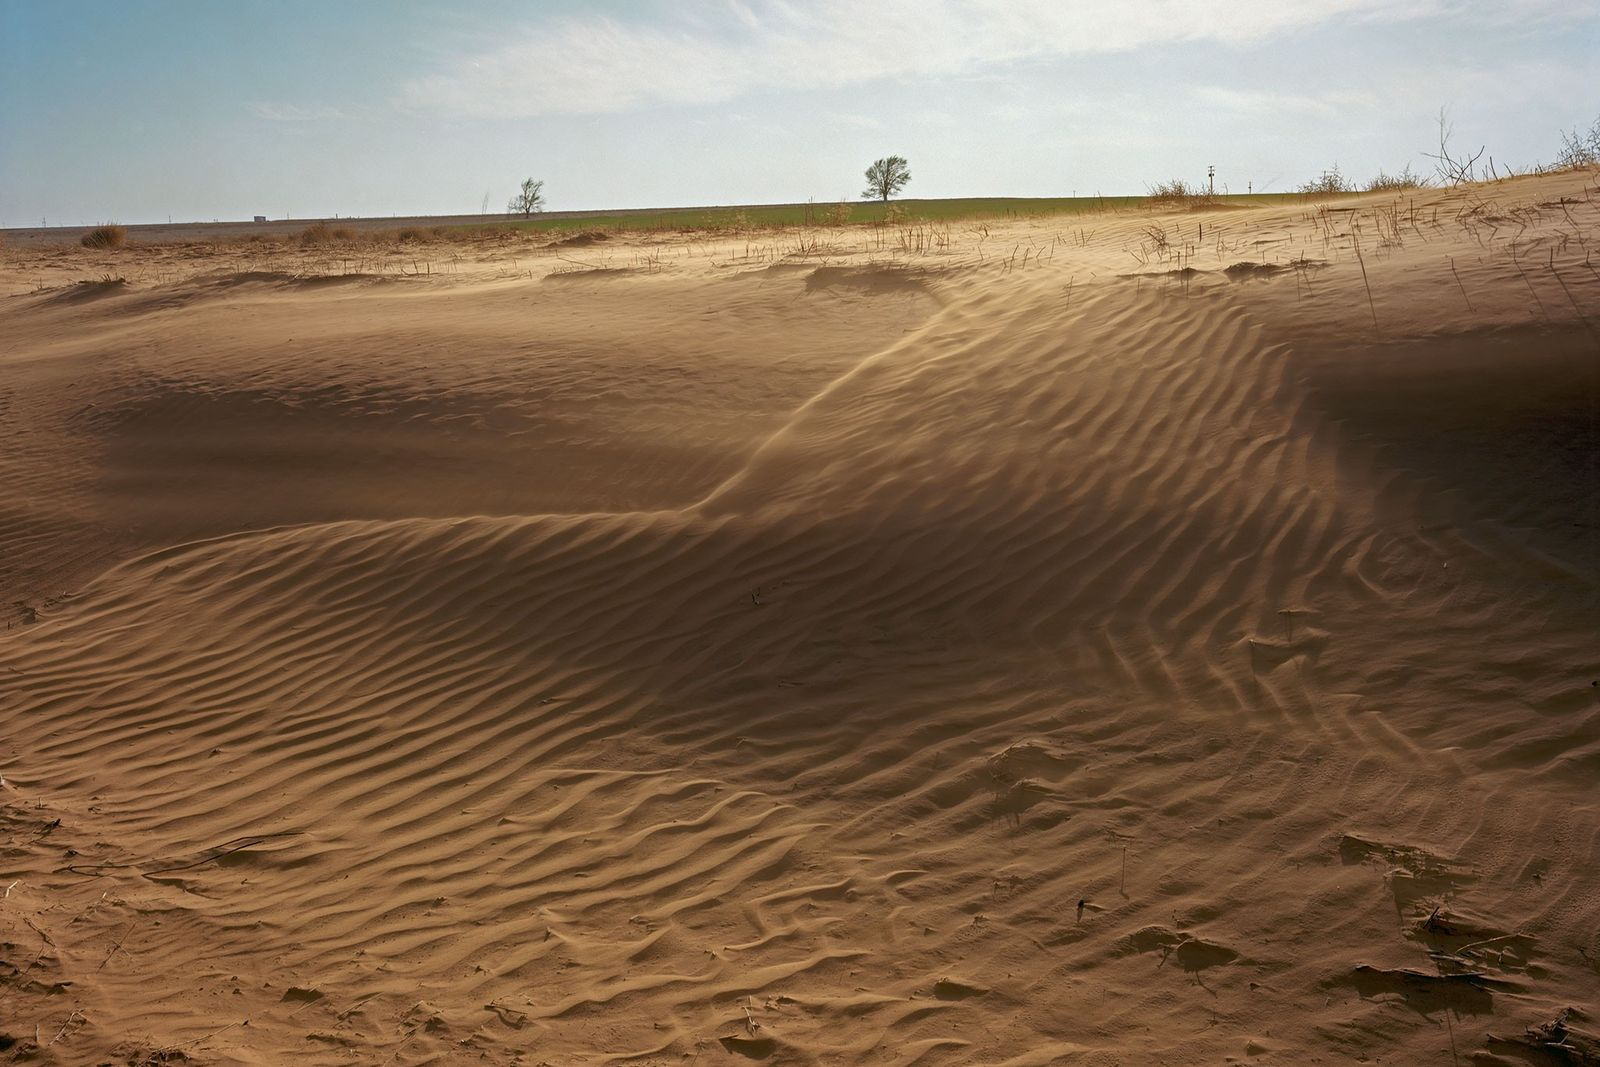 Terreno degradado pelo vento